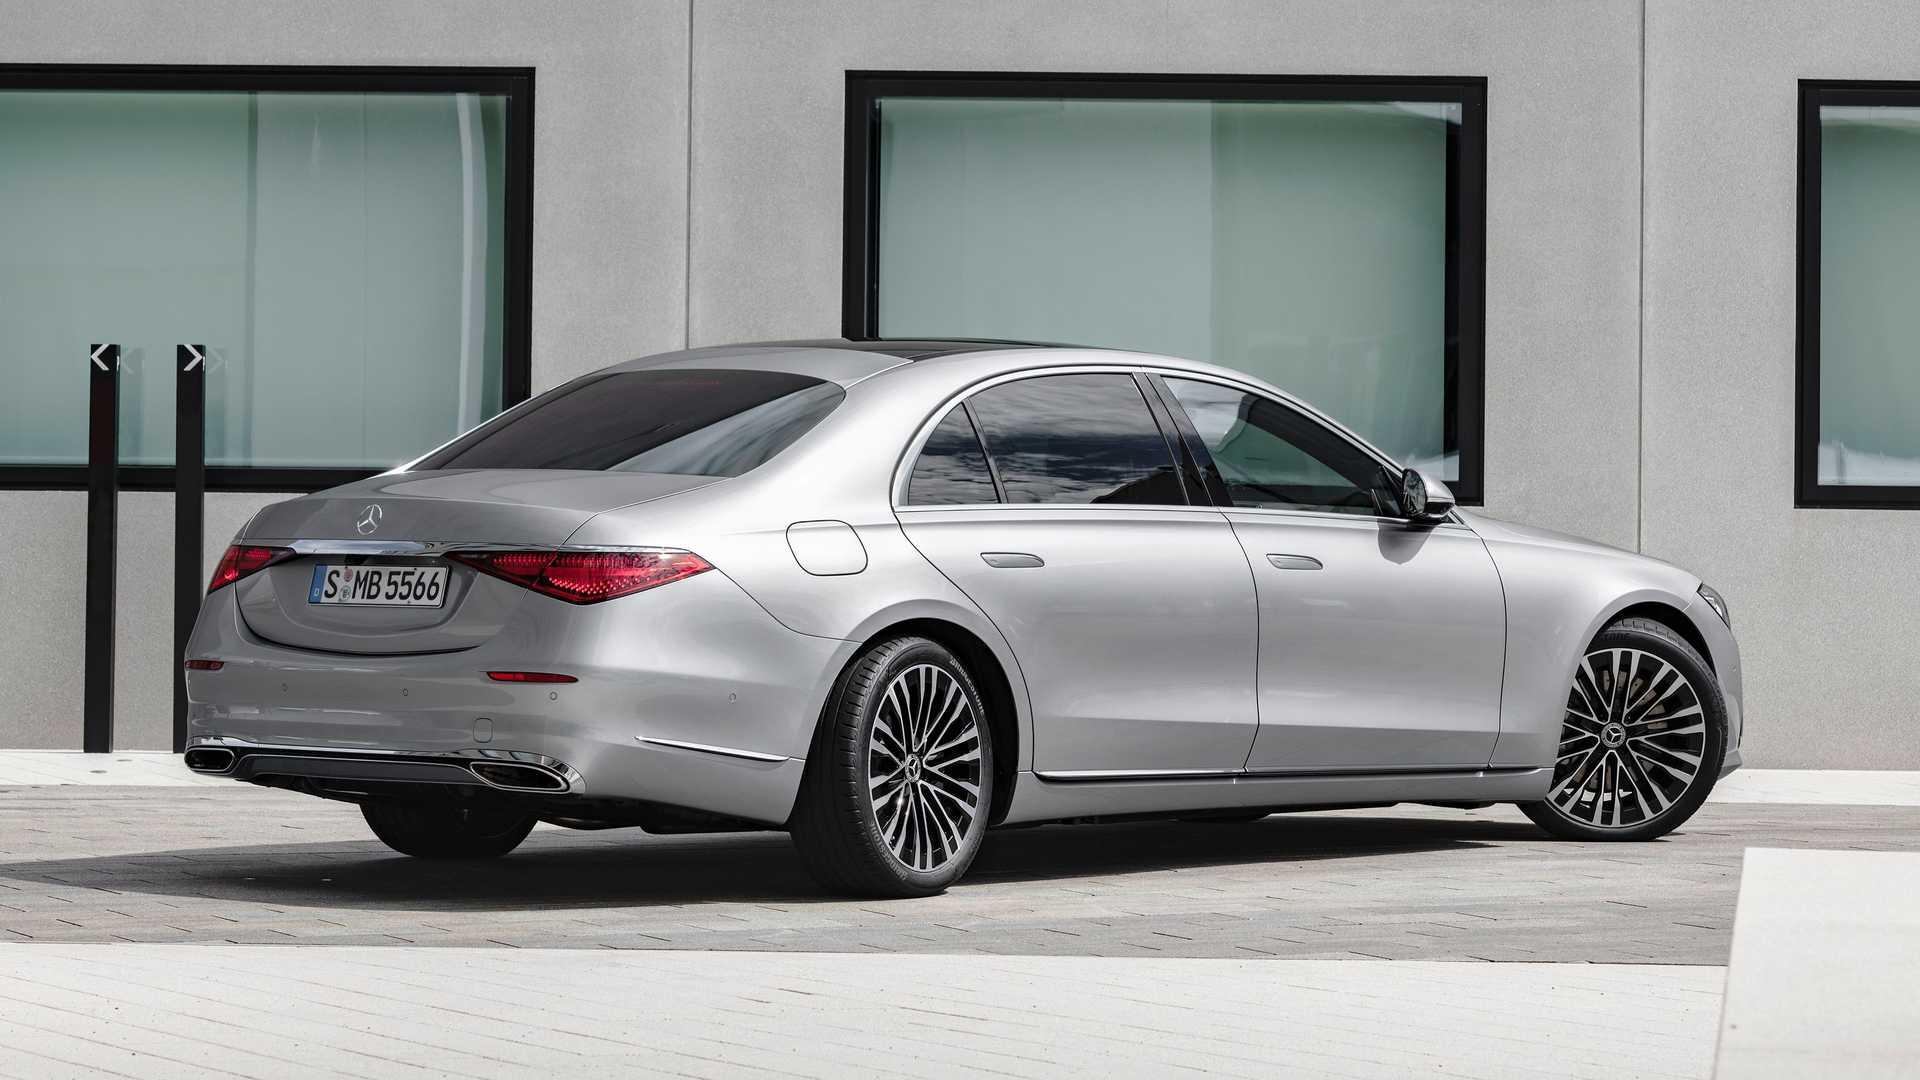 2021-mercedes-benz-s-class-sedan-exterior (1)